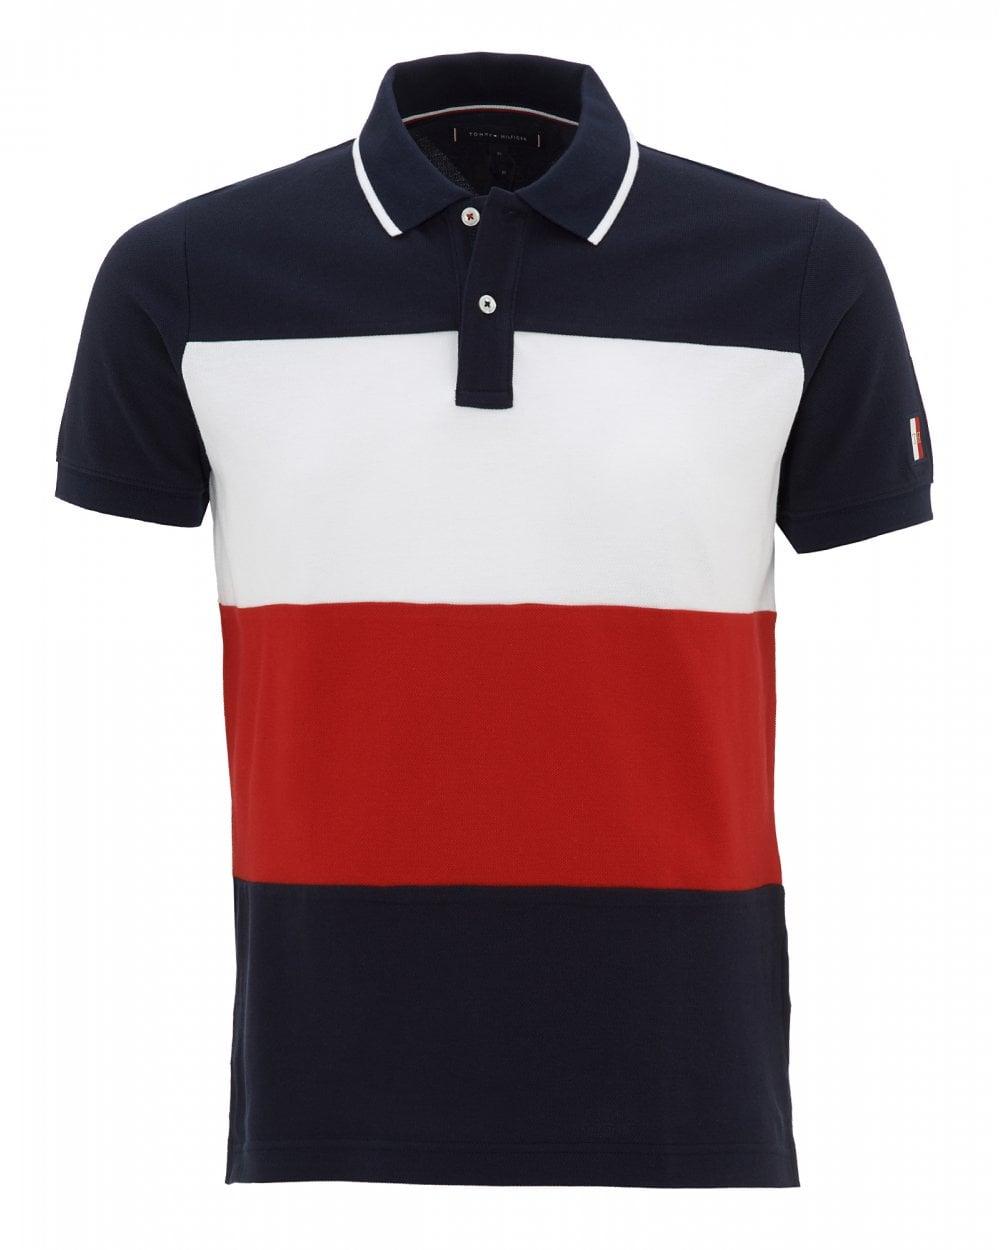 ada94c9e Tommy Hilfiger Mens Colour Block Slim Fit Polo Shirt